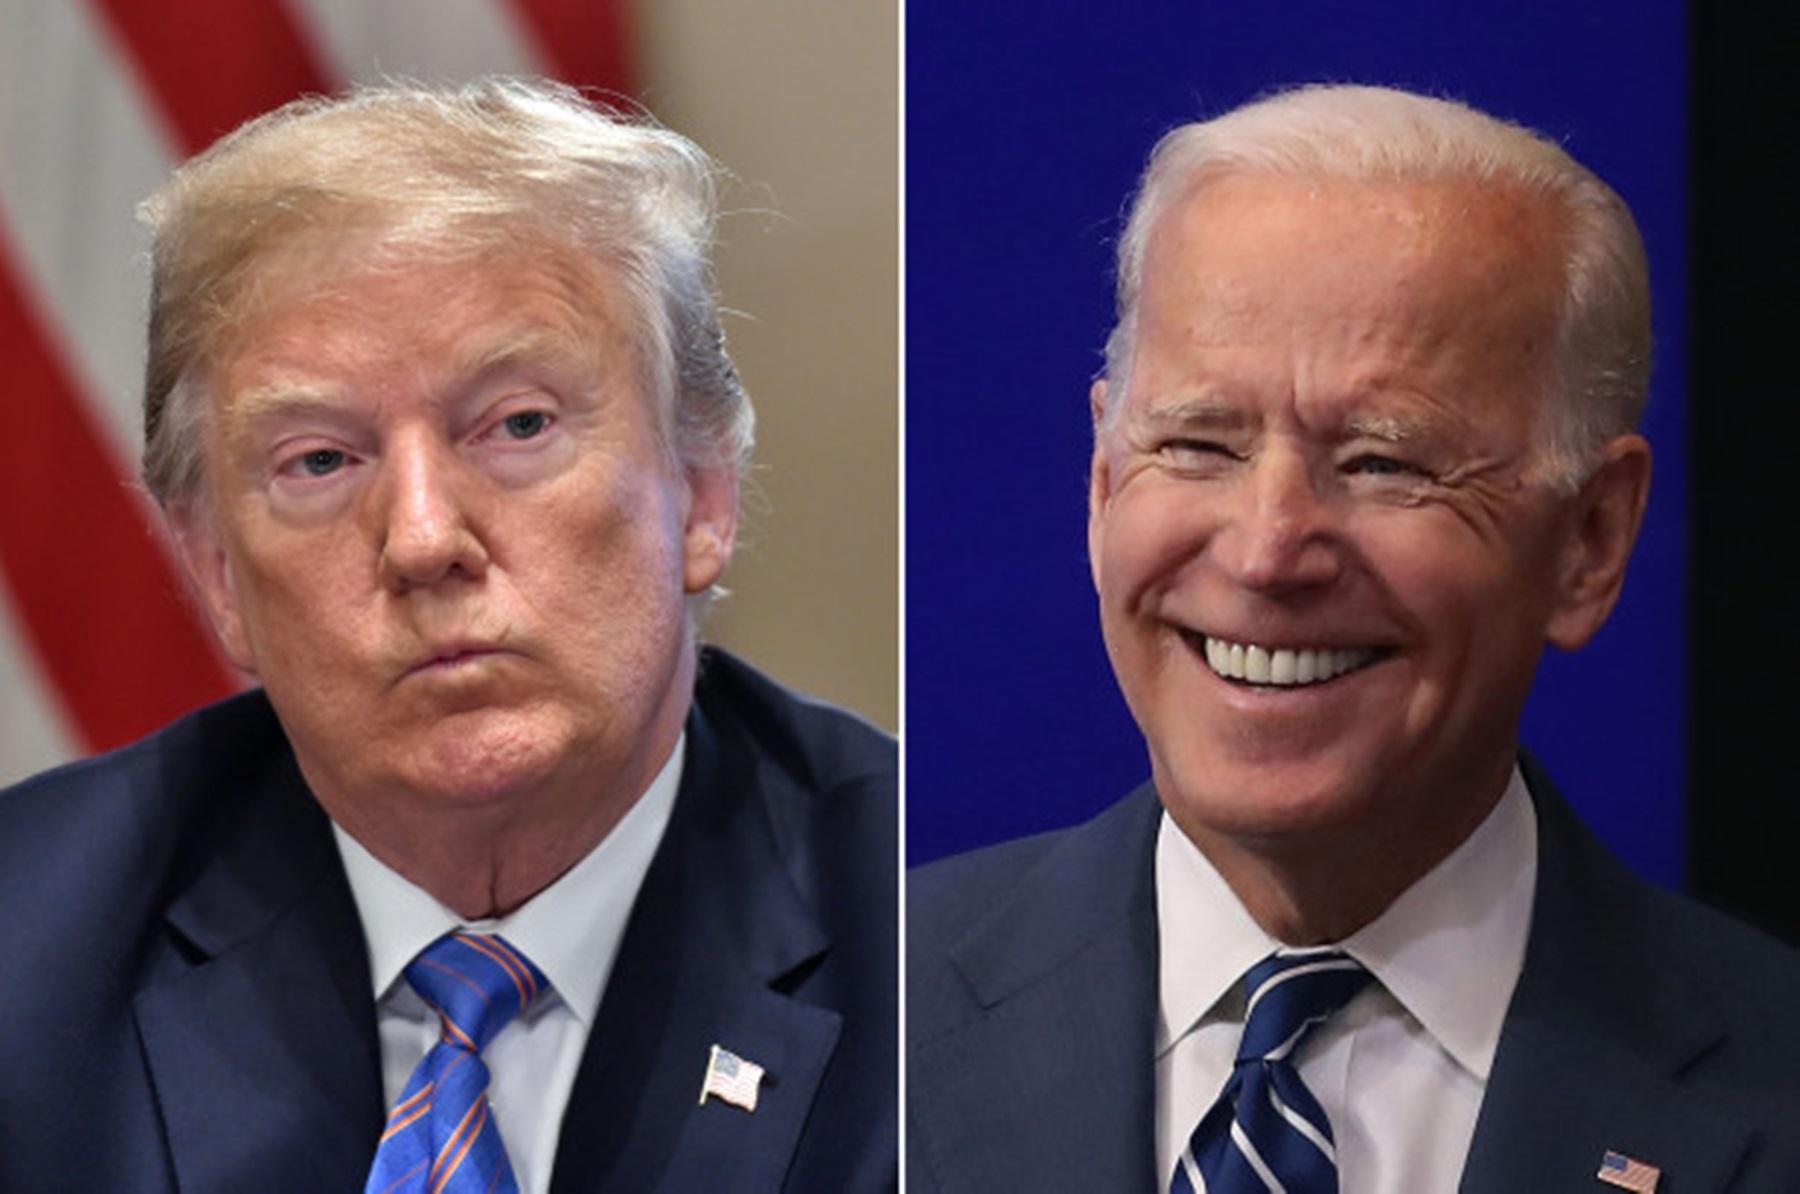 Donald Trump Joe Biden New Hampshire